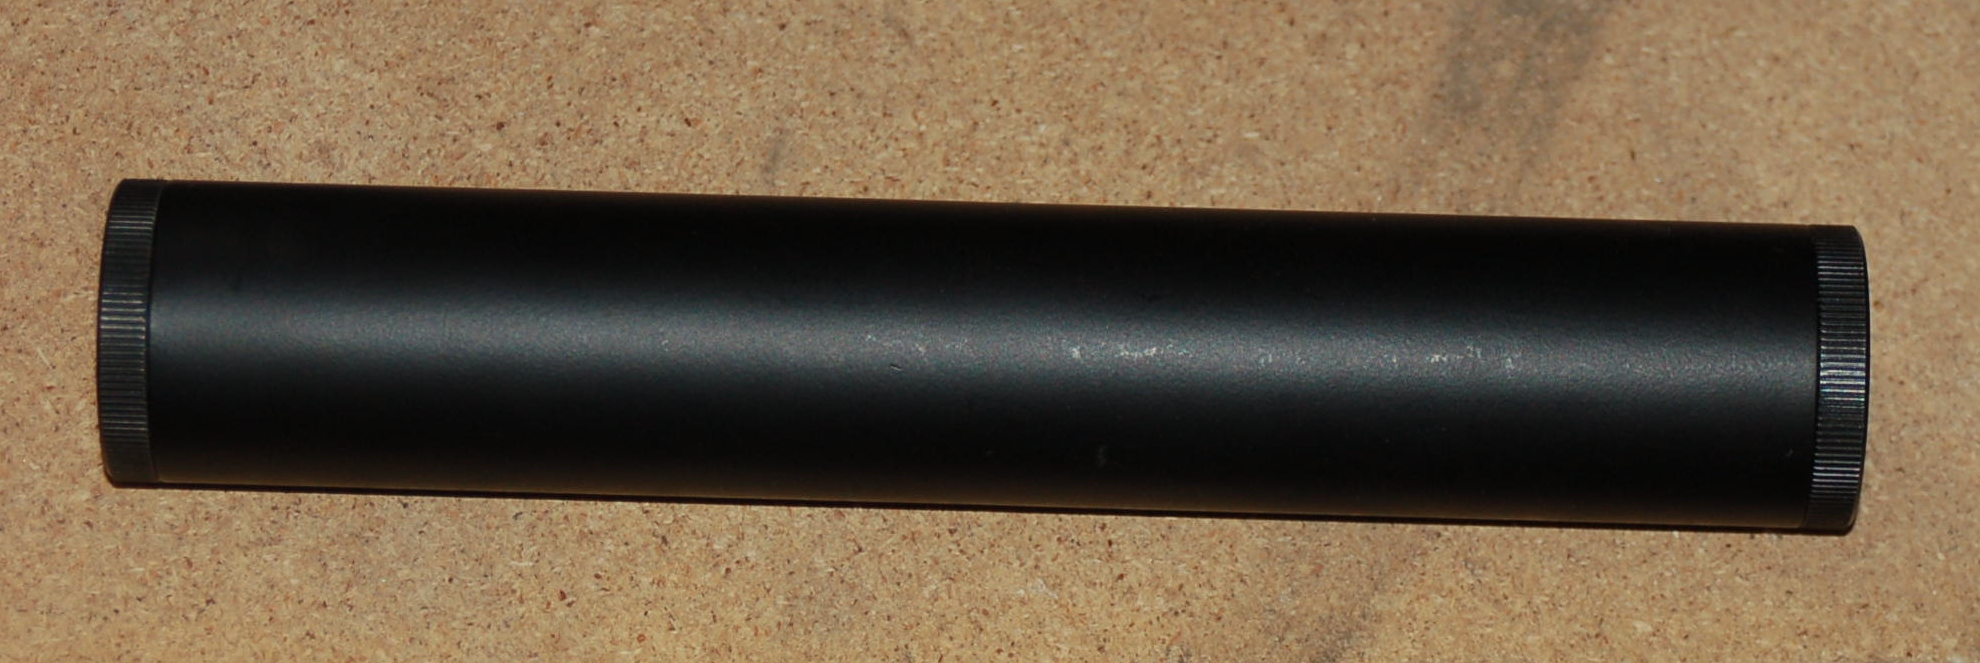 Form 1 suppressor - Rifle Suppressors - 308AR com Community